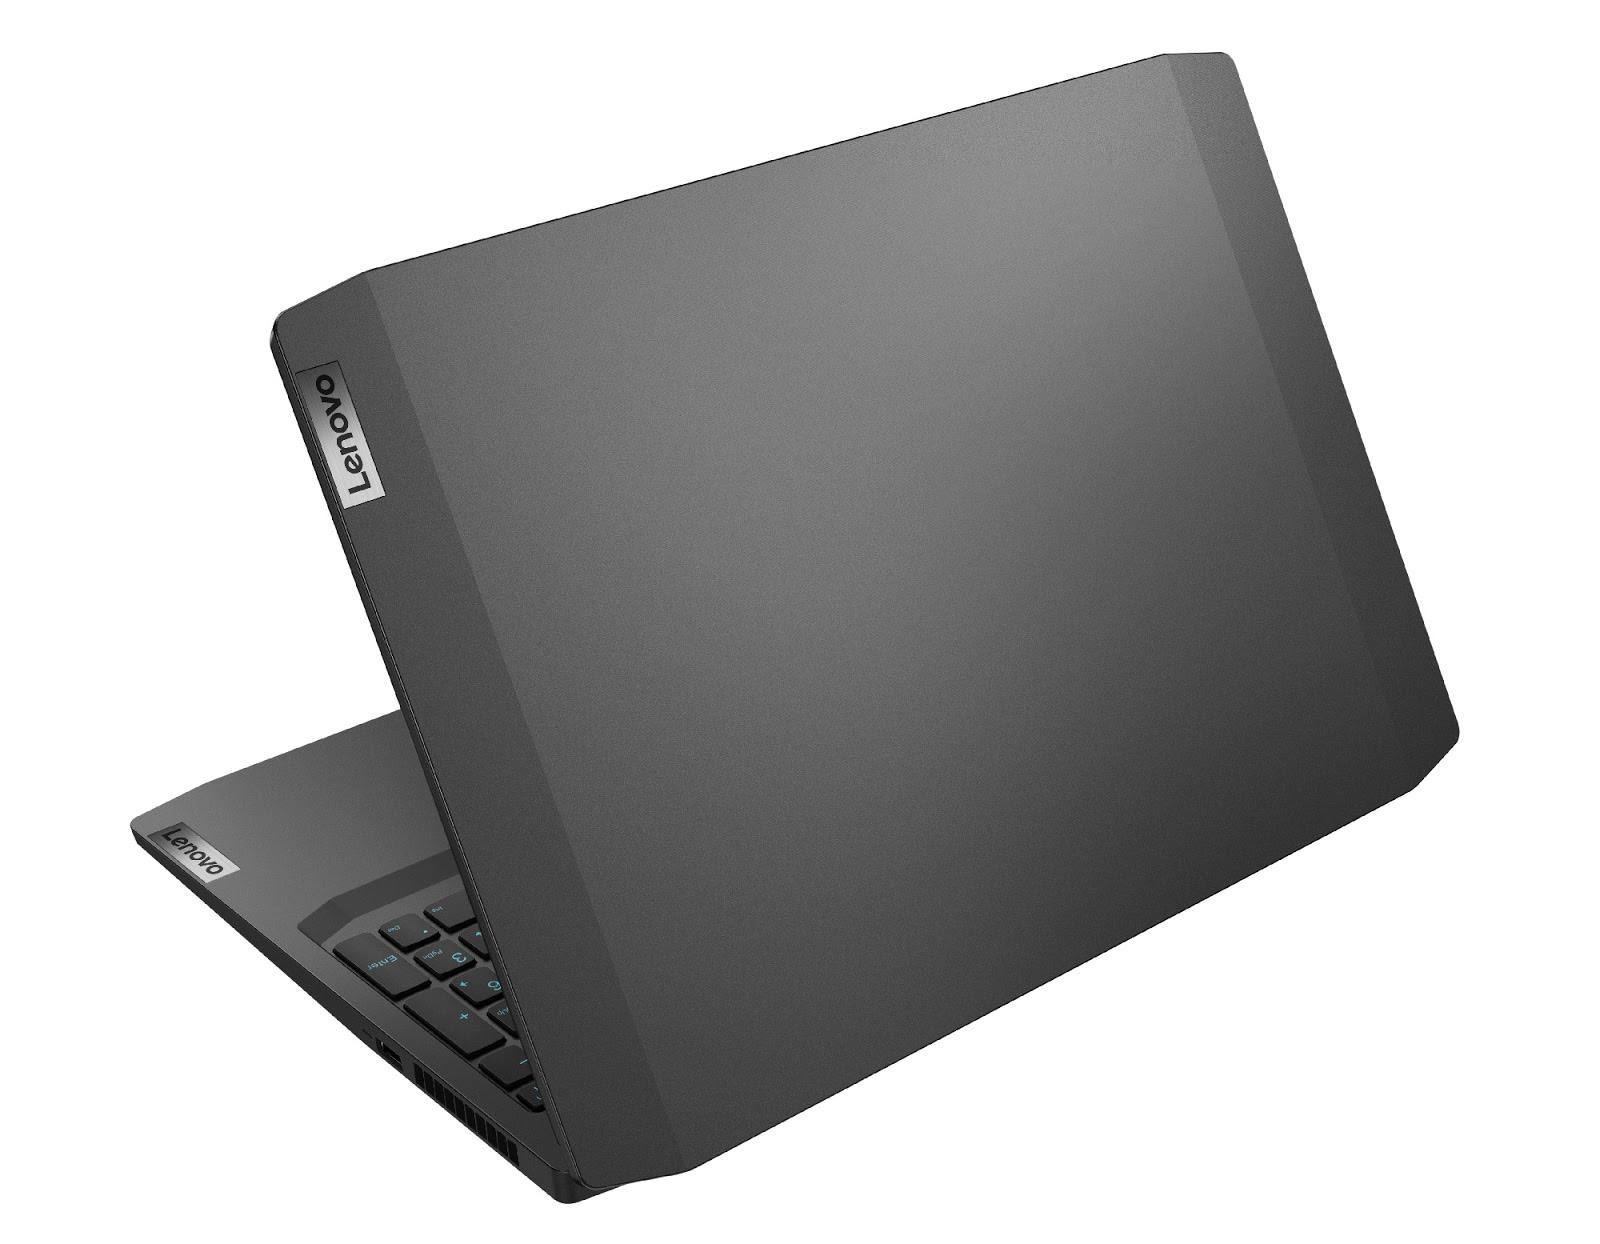 Фото 2. Ноутбук Lenovo ideapad Gaming 3 15IMH05 Onyx Black (81Y400TLRE)